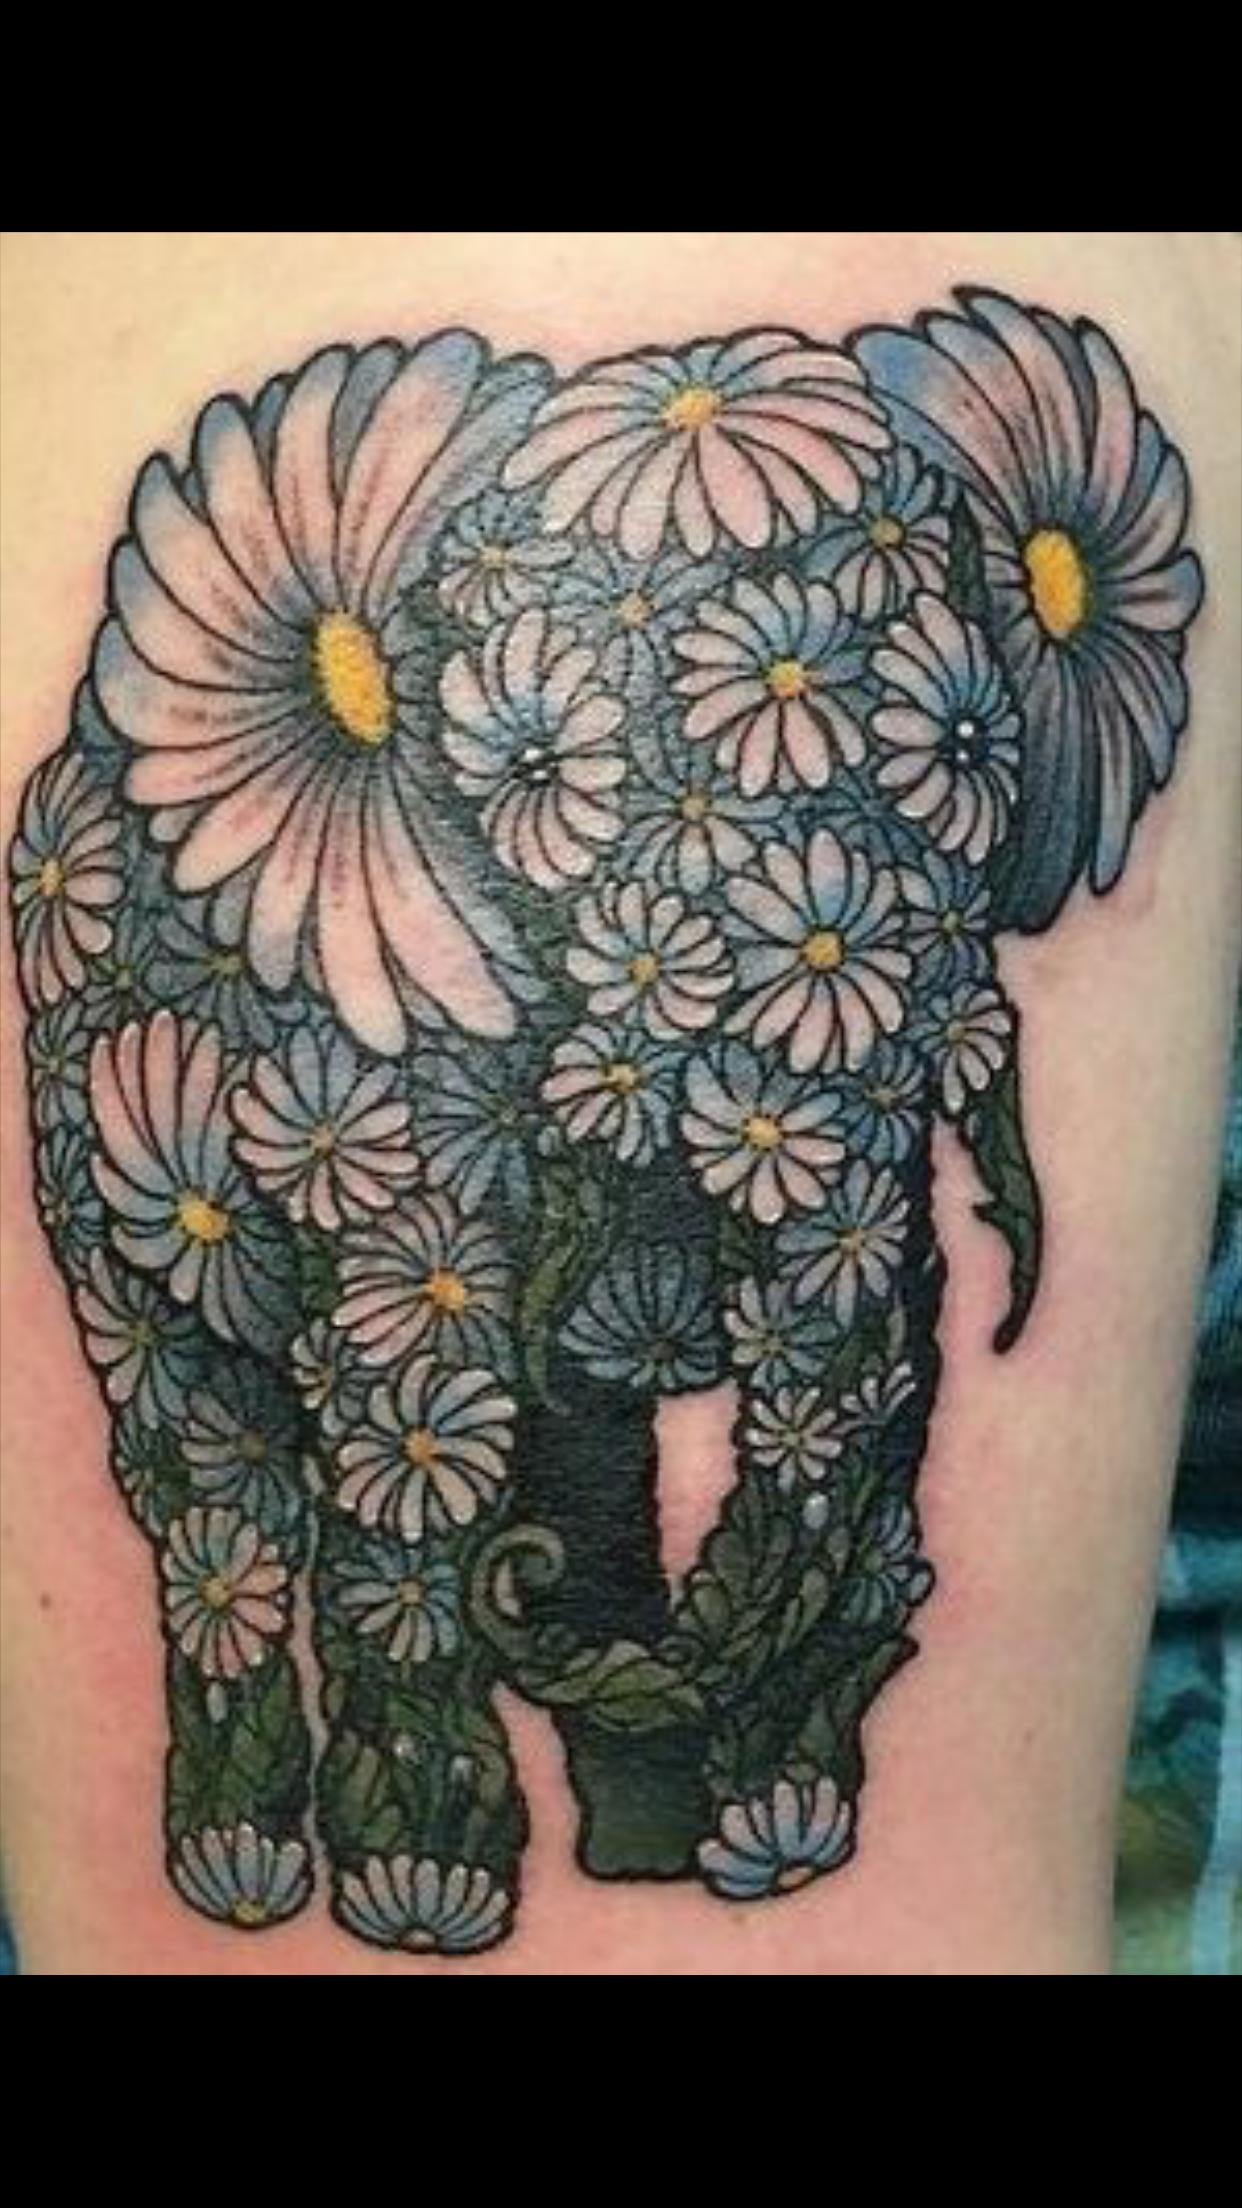 Pin by Anıl Yıldırım on Elephant tattoo ideas Daisy